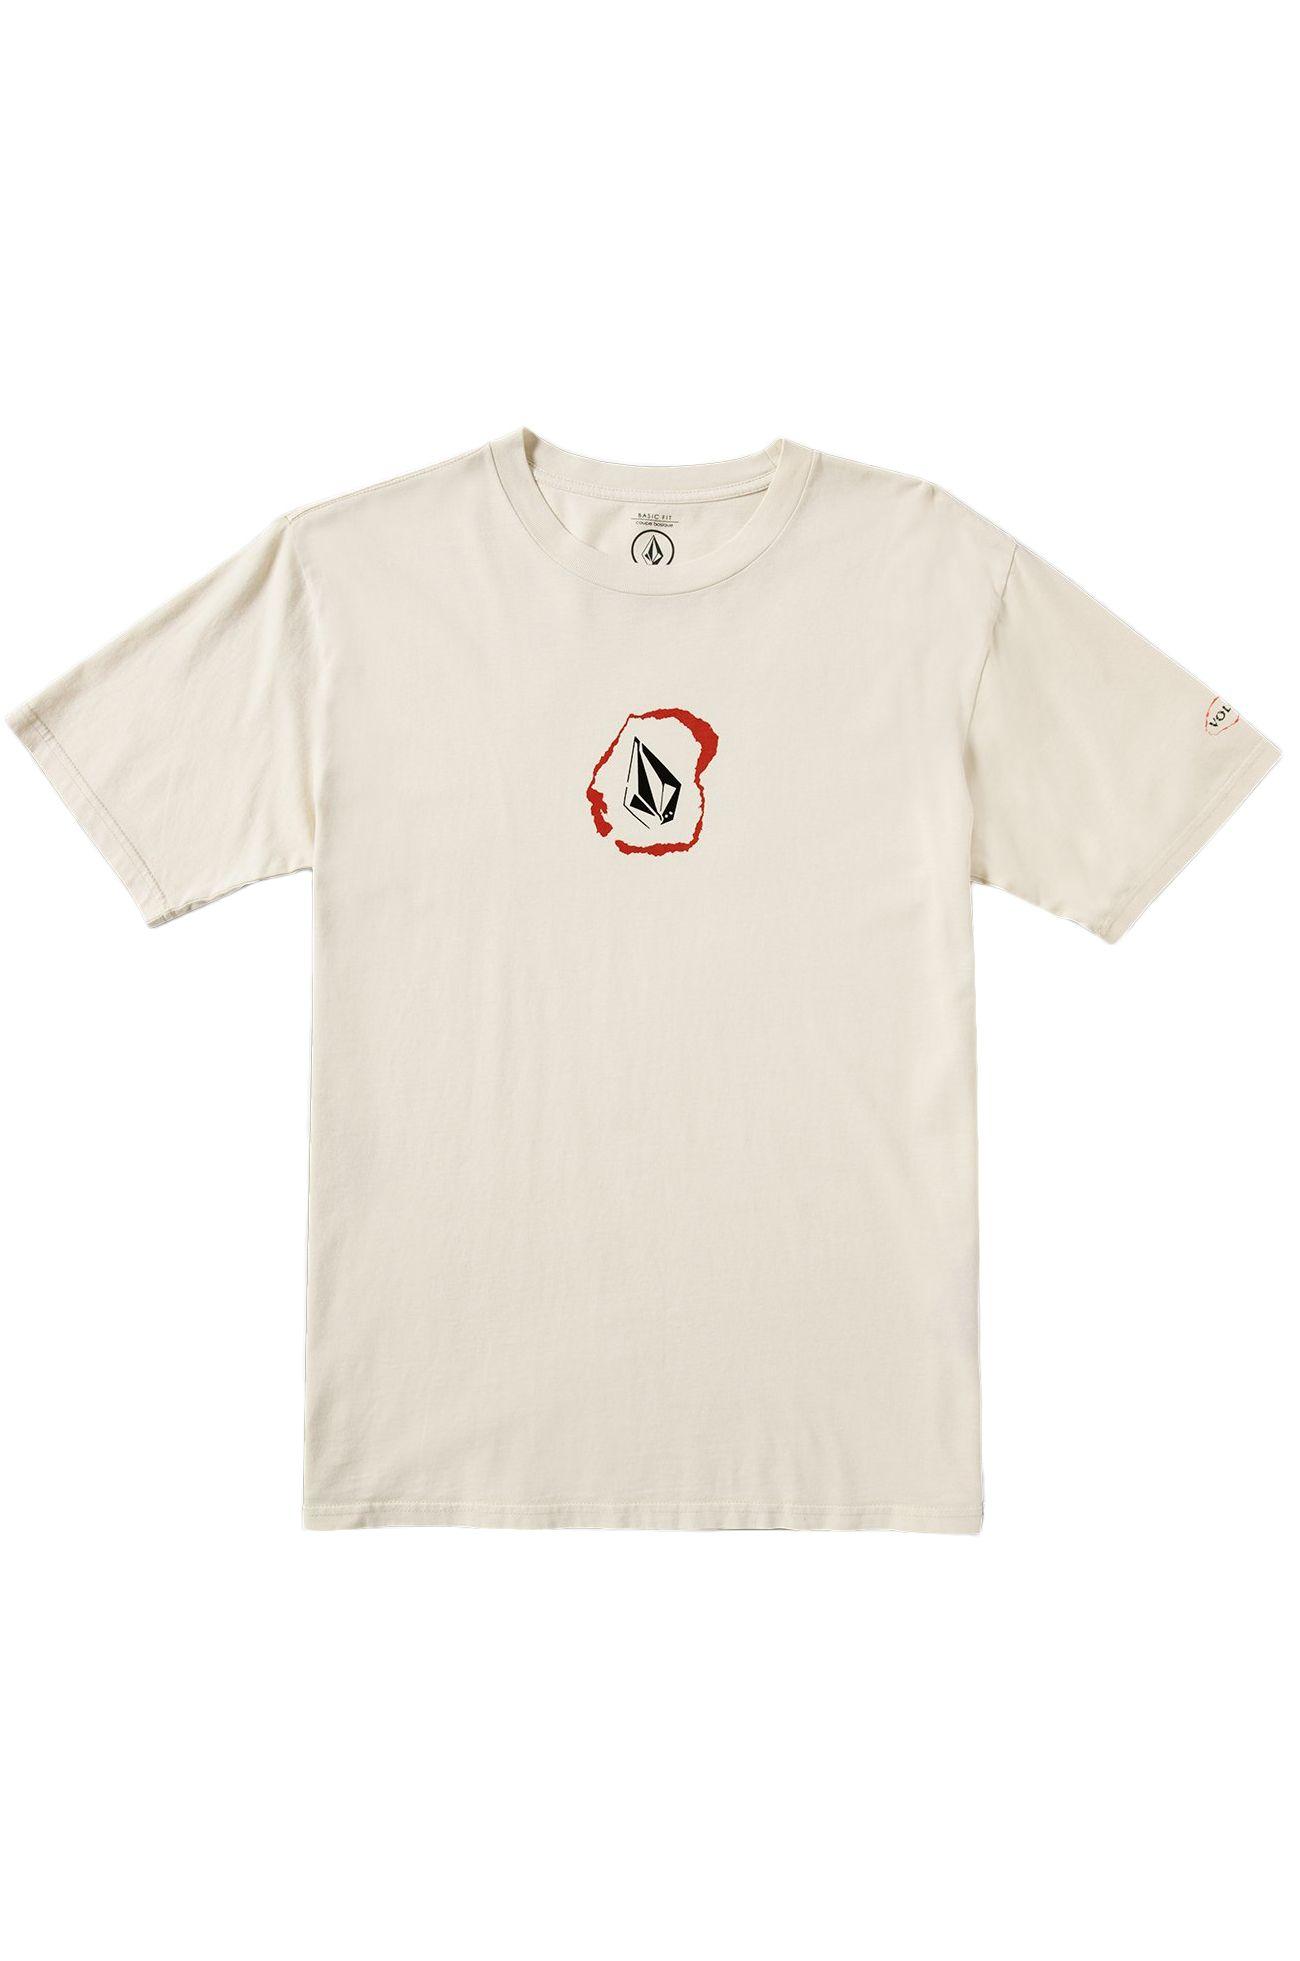 T-Shirt Volcom POSTED White Flash